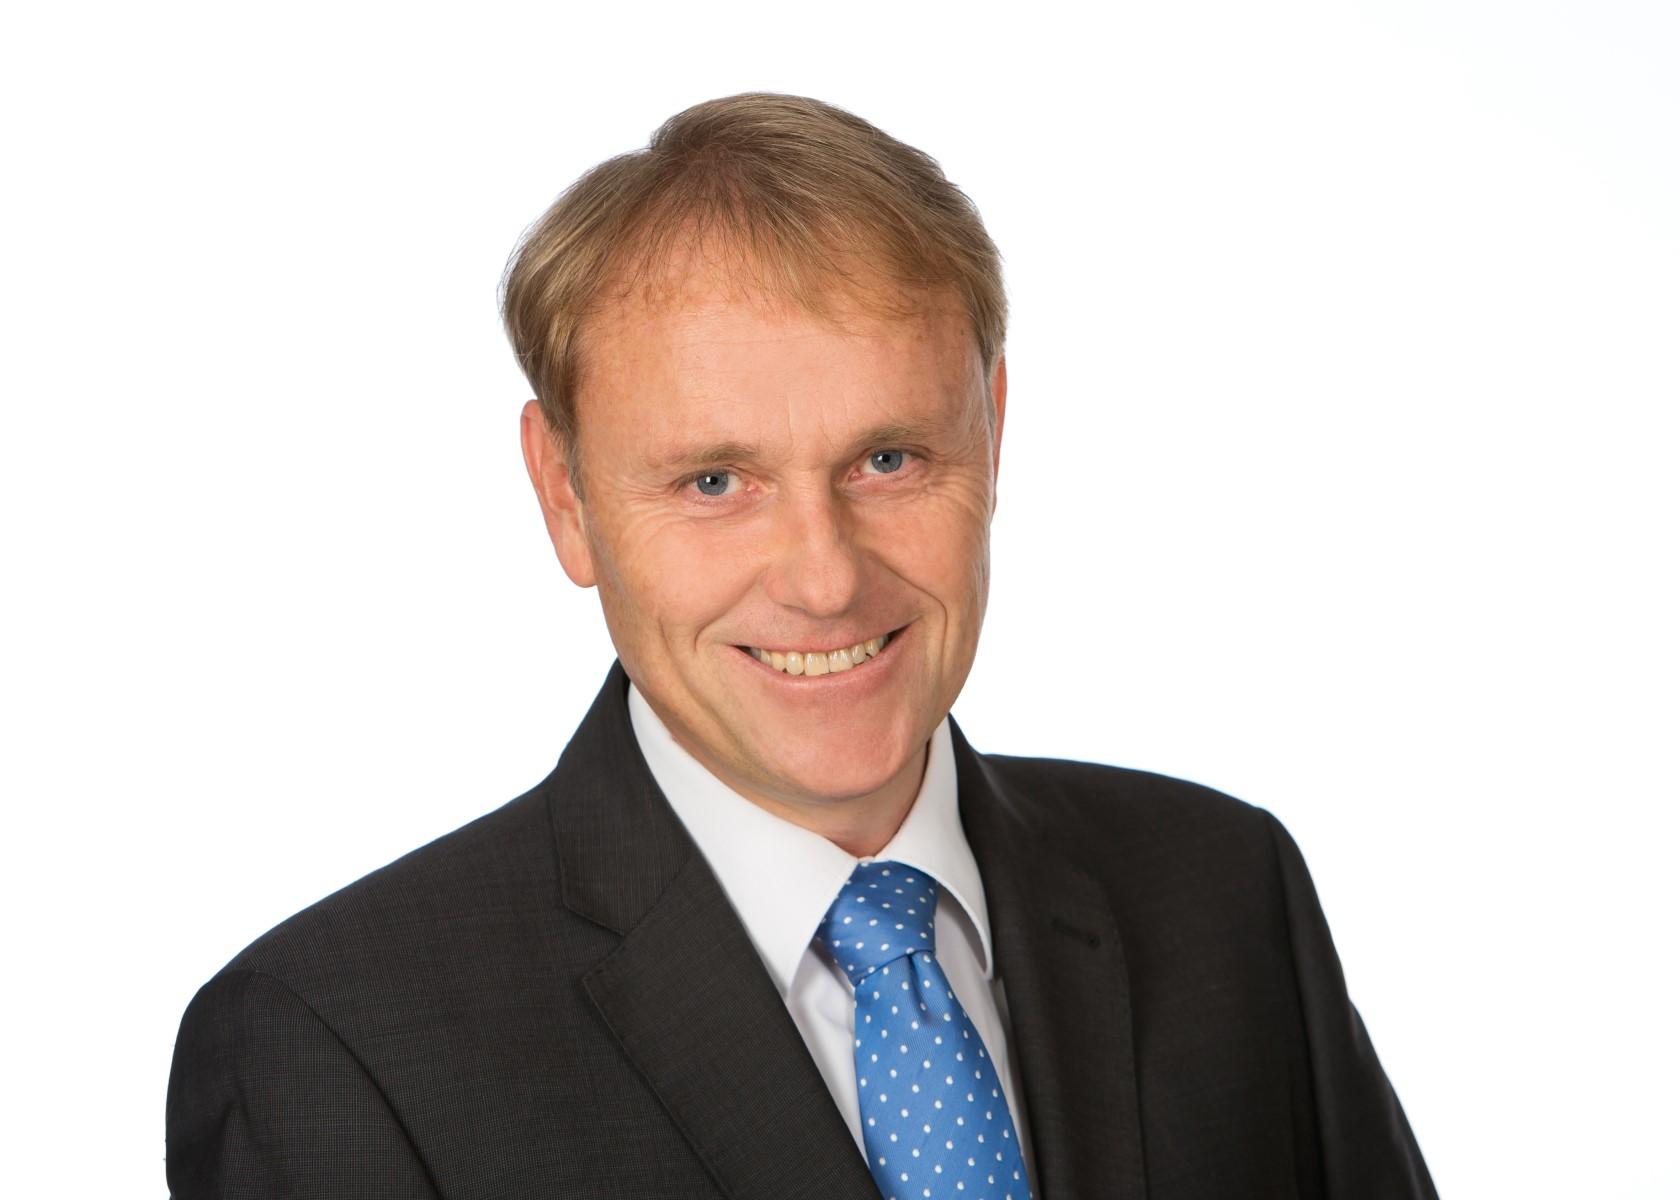 Armin Jabs BfP